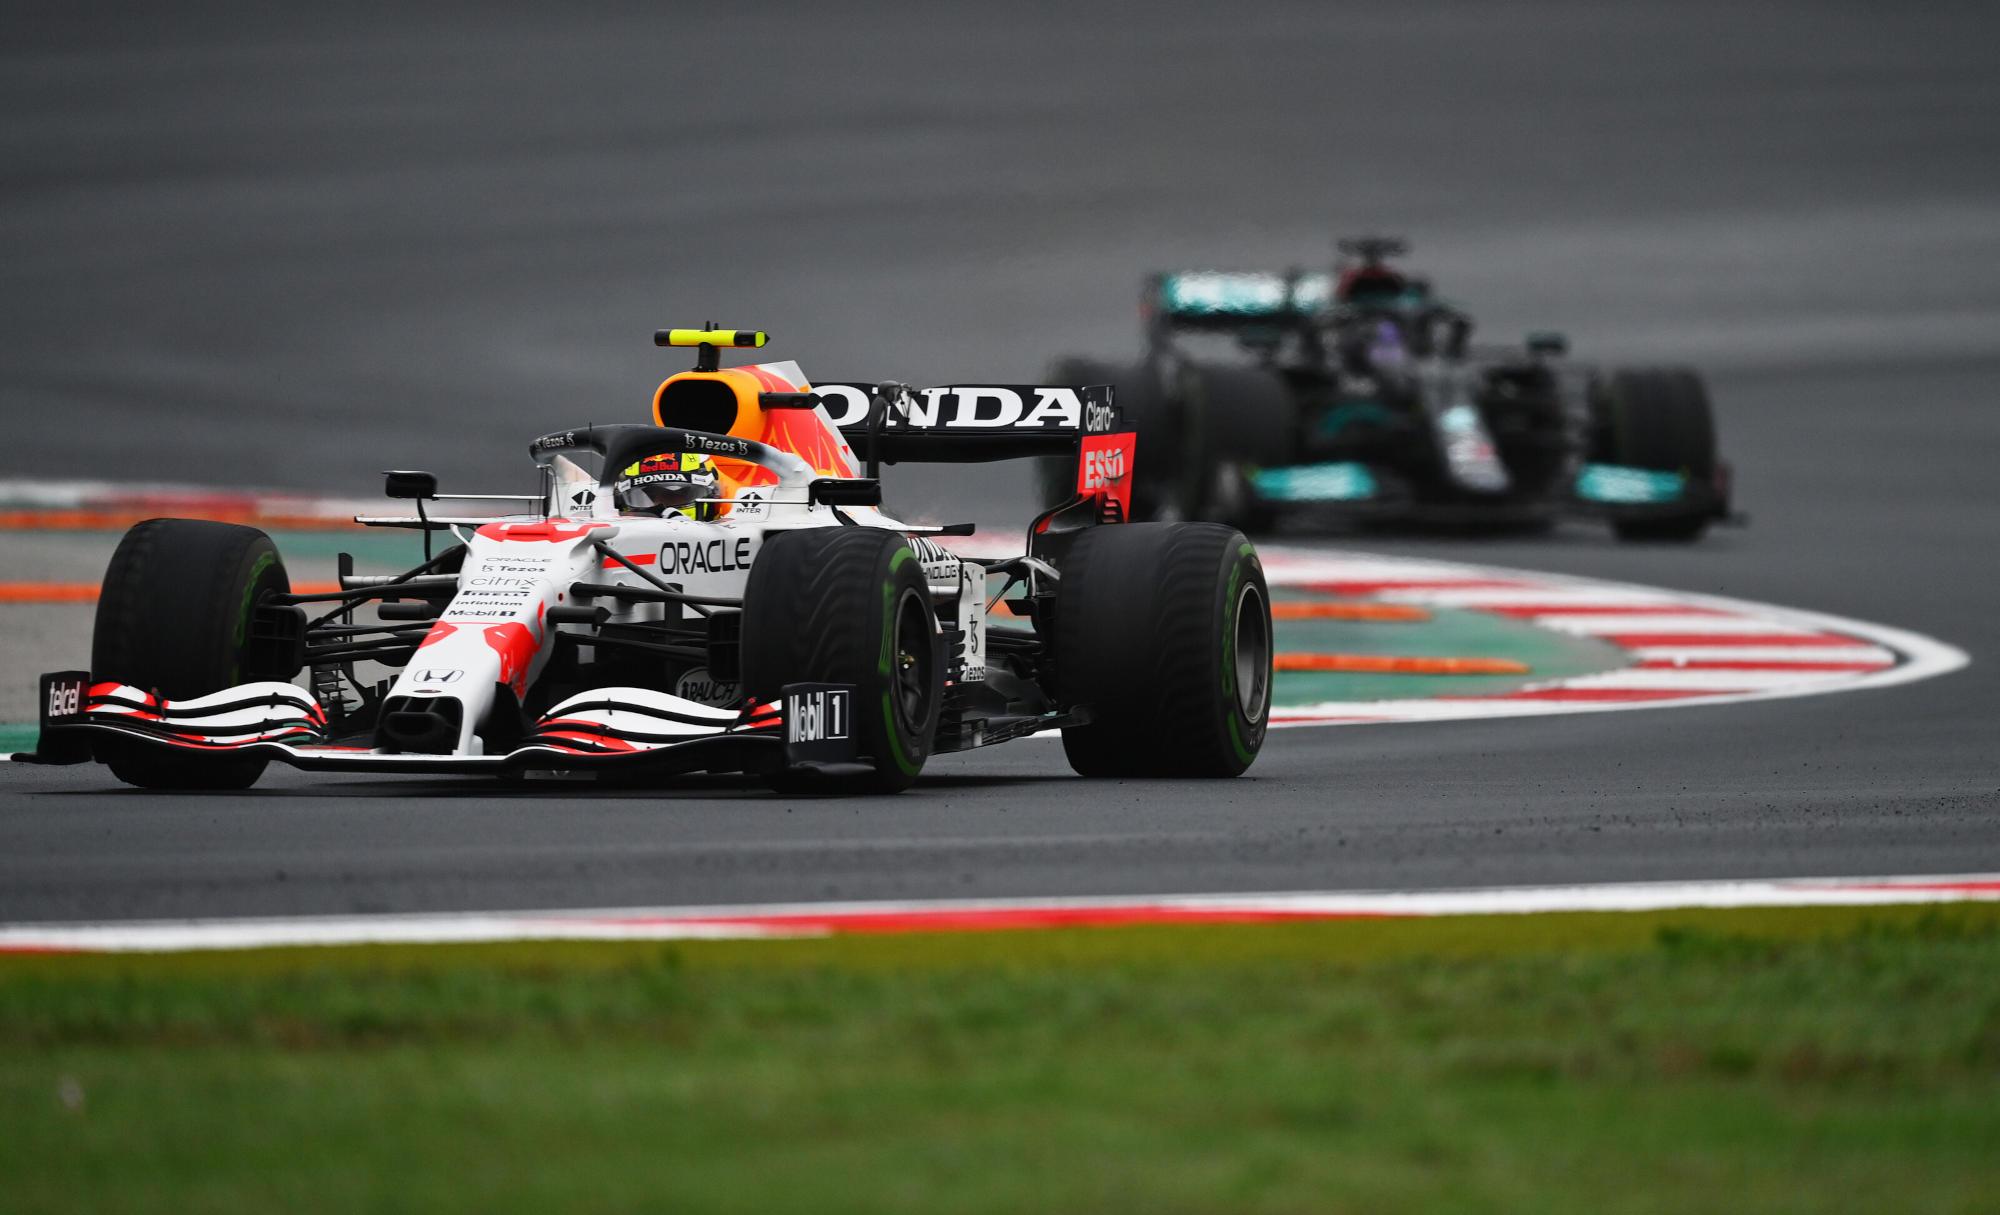 2021-Turkish-GP-Perez-leads-Hamilton-Photo-Red-Bull